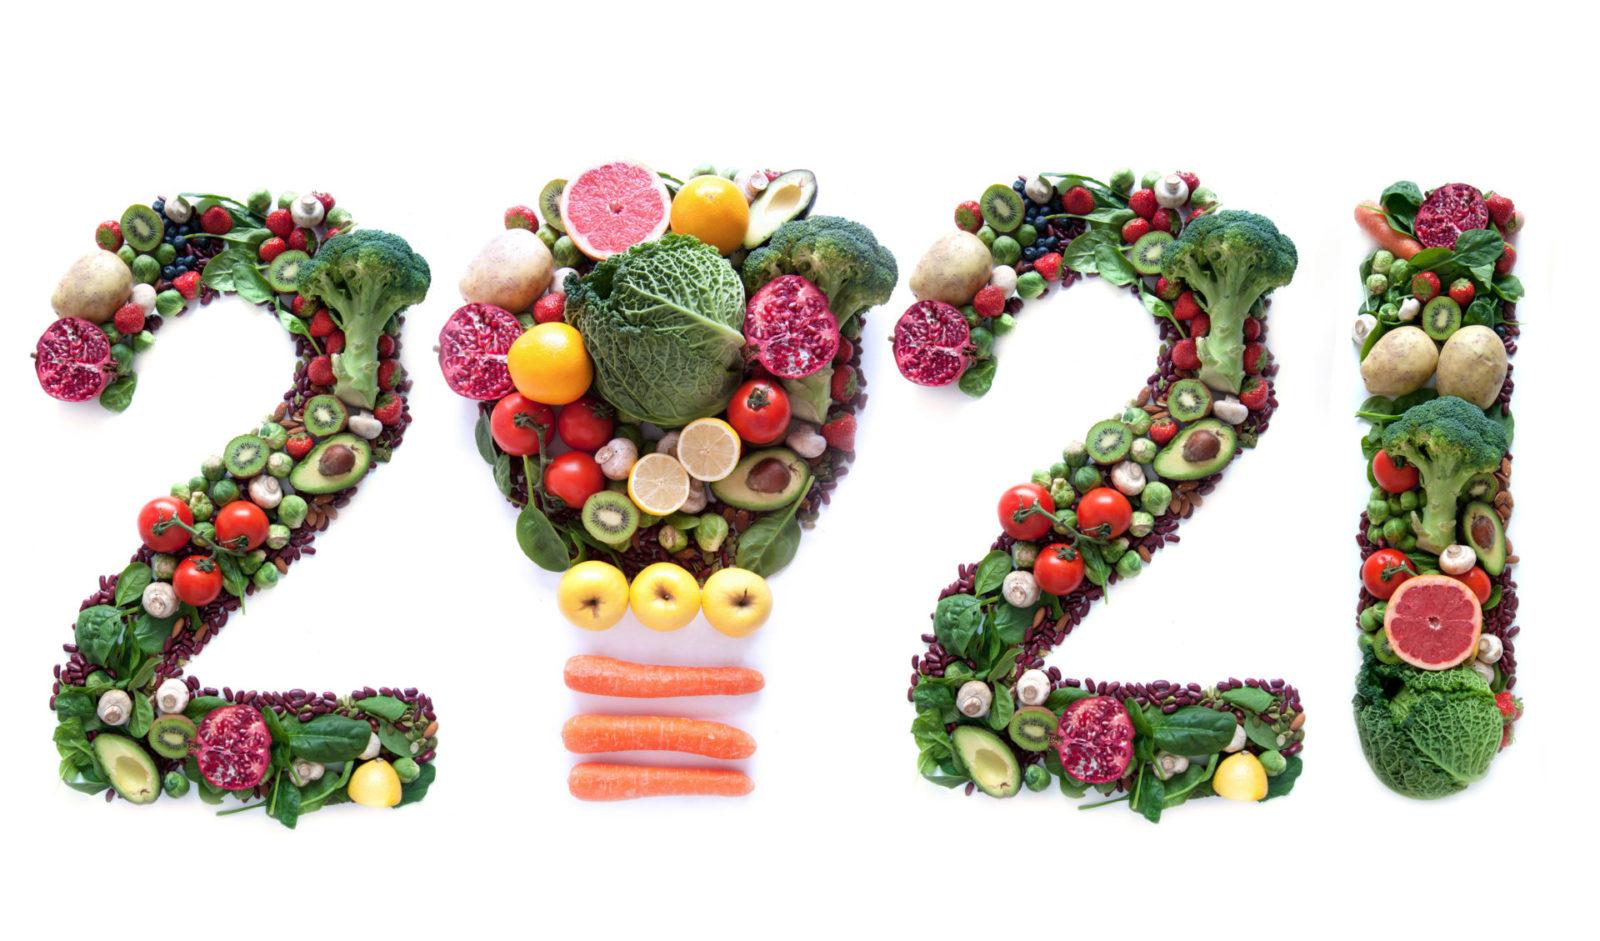 KICK START YOUR NEW YEAR!